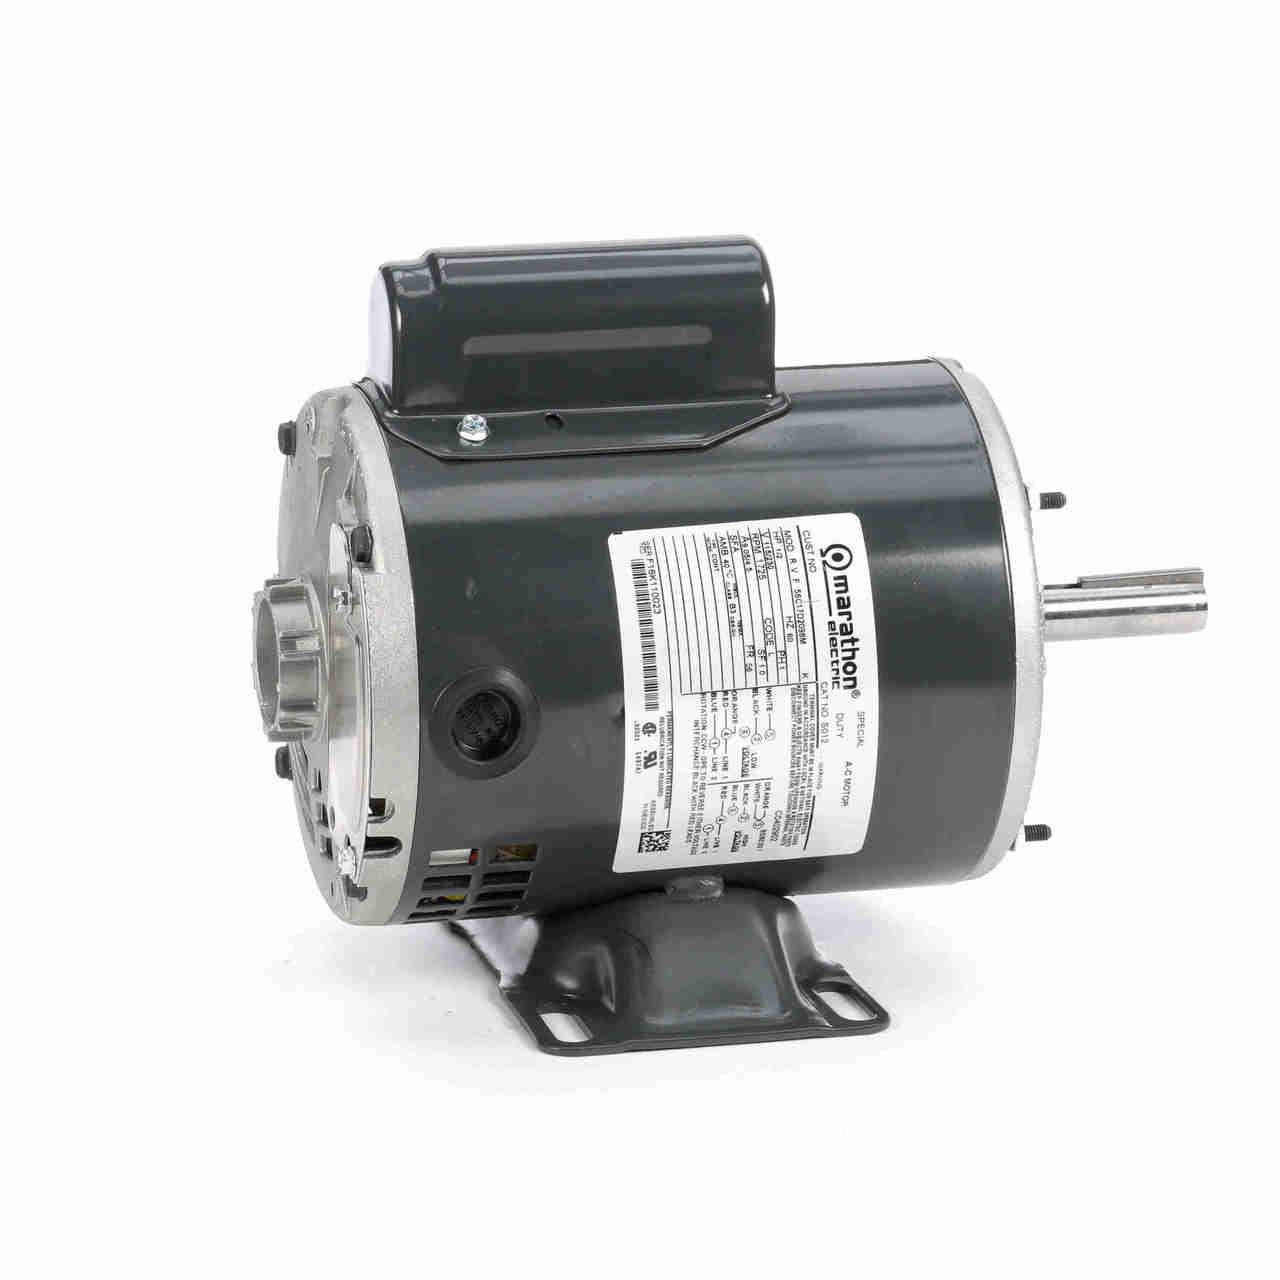 J077 Swimming Pool Pump Single Phase Motor 1-1/2 HP